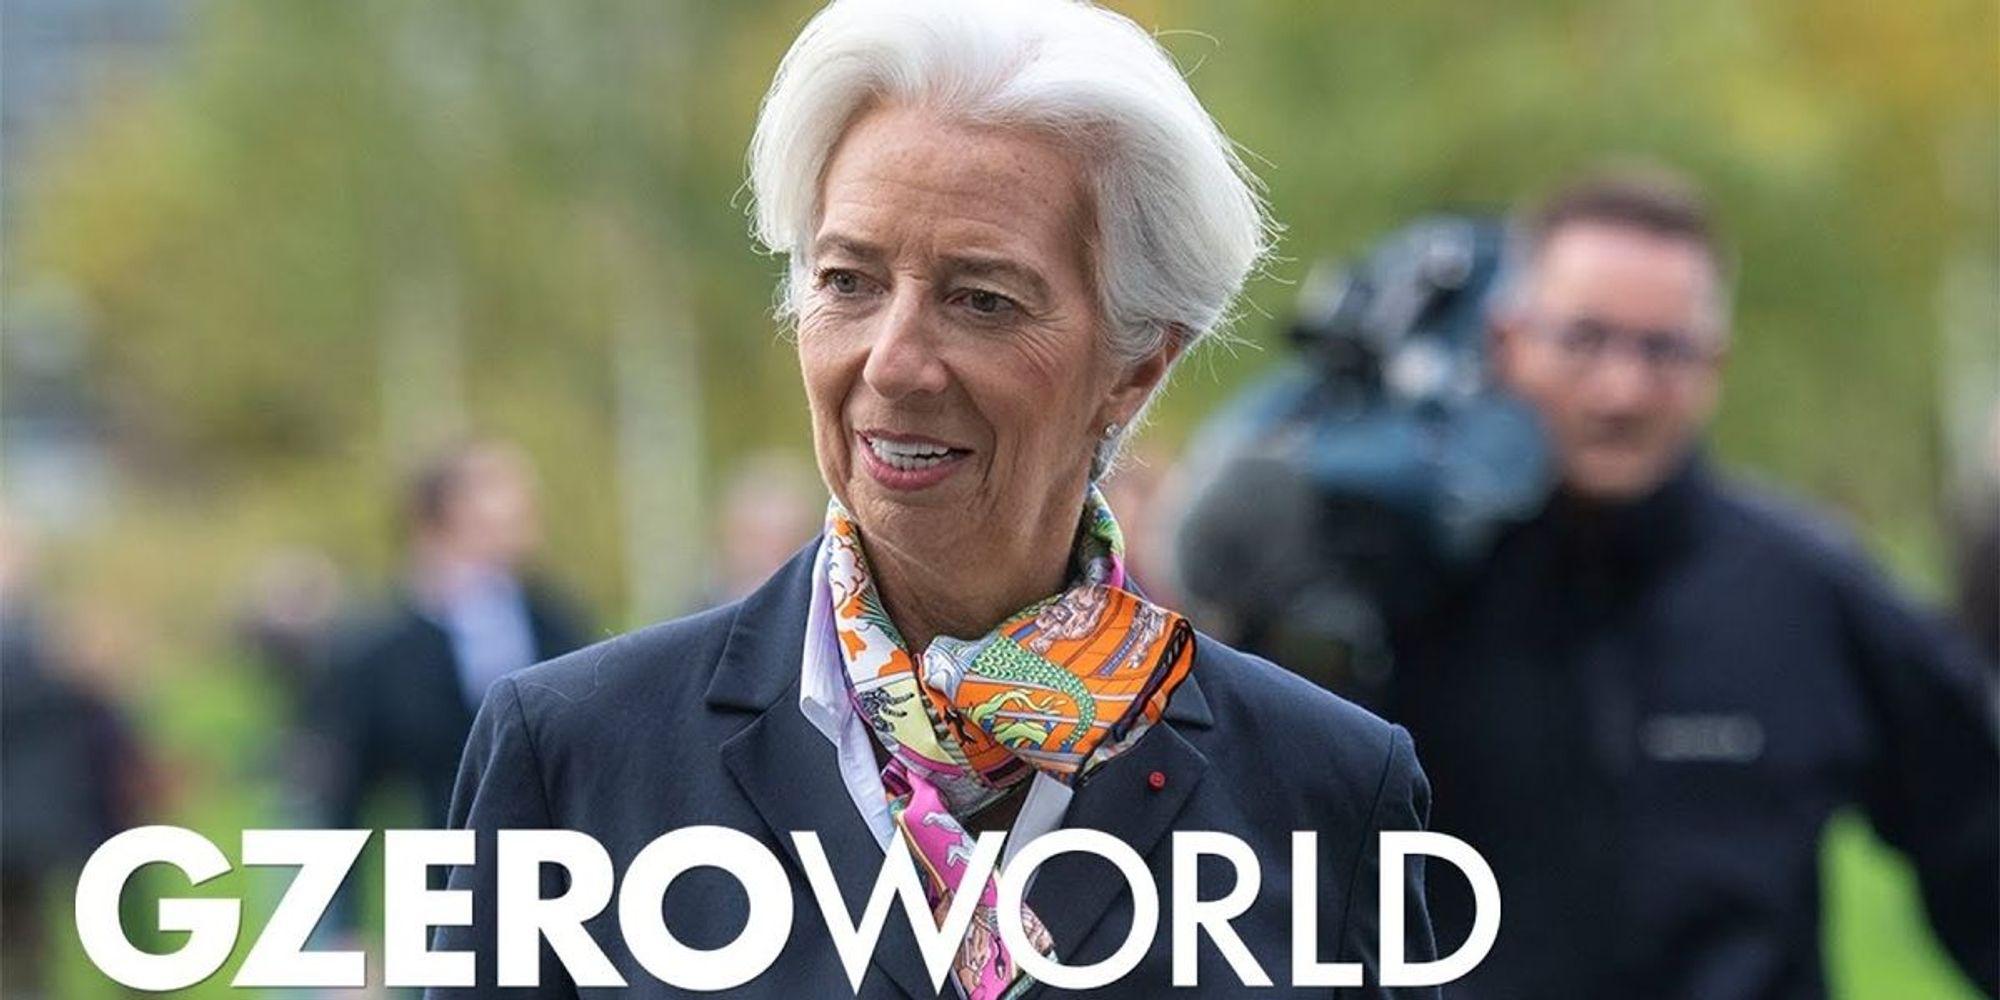 Christine Lagarde, Leading Europe's United Economic Pandemic Response